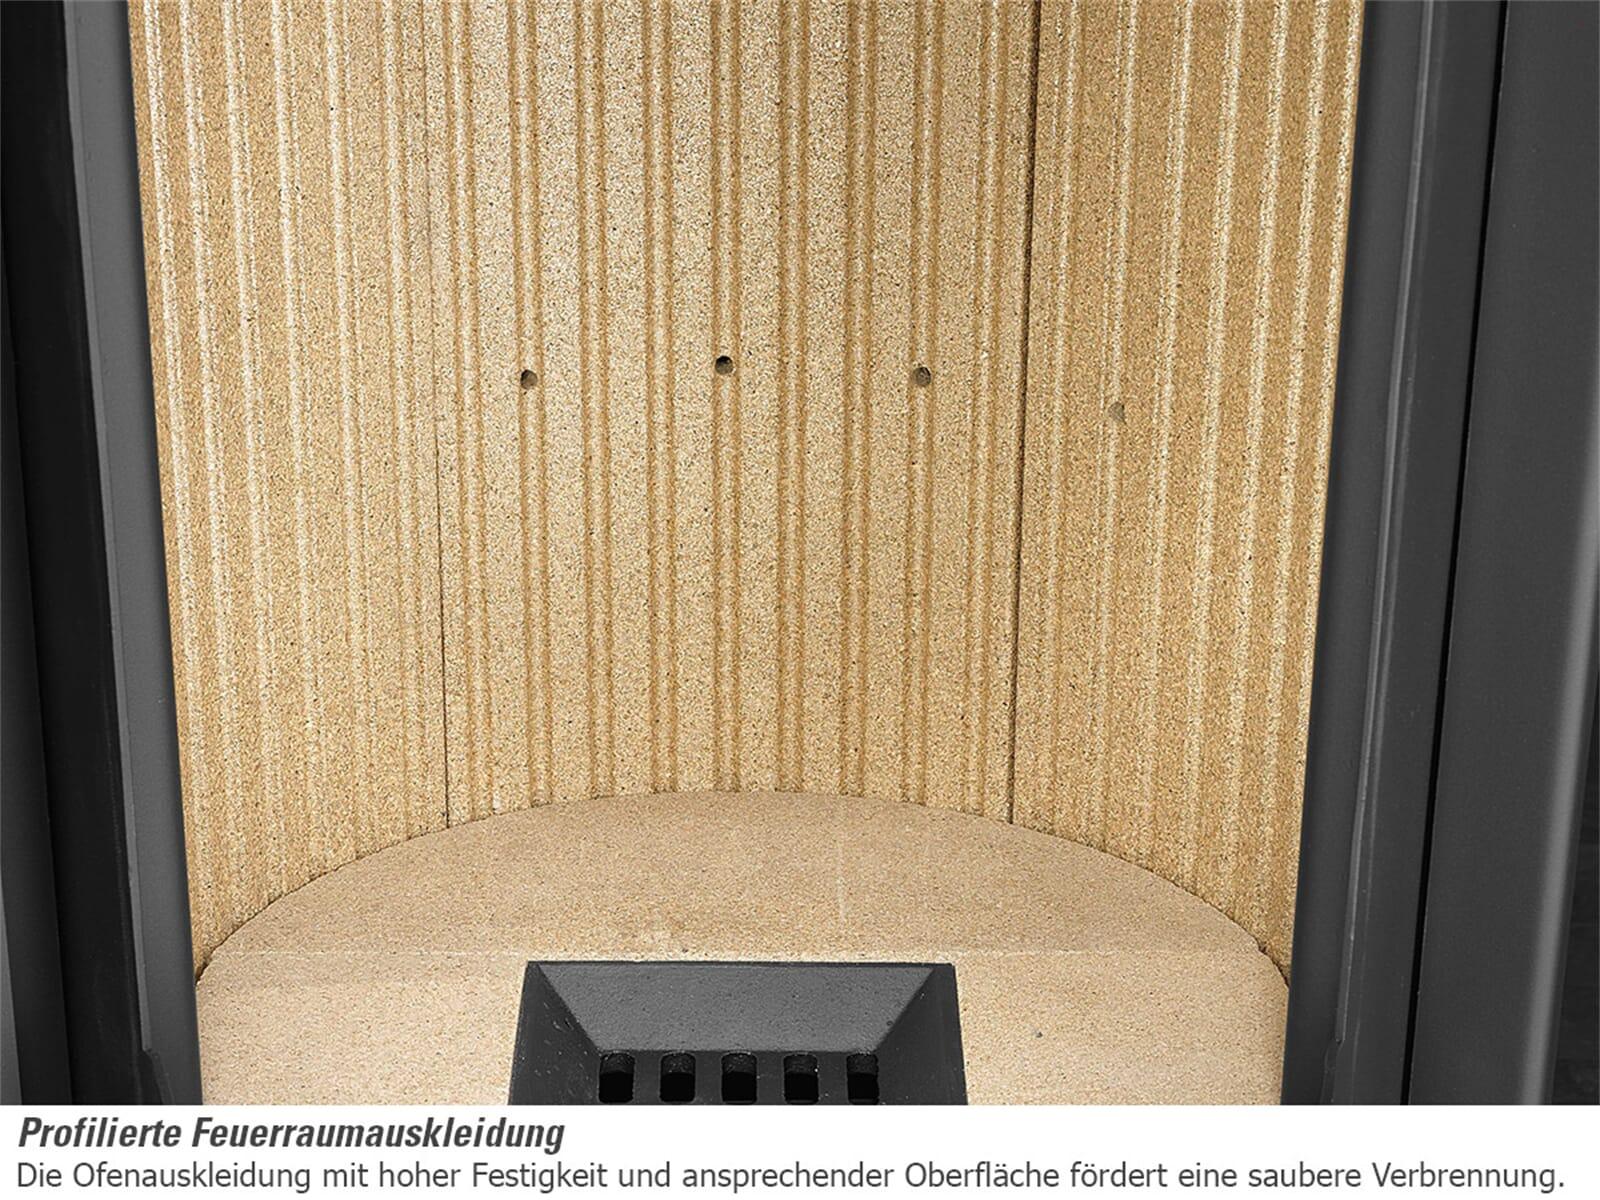 justus faro plus 4693 11 kaminofen stahl schwarz abdeckplatte. Black Bedroom Furniture Sets. Home Design Ideas